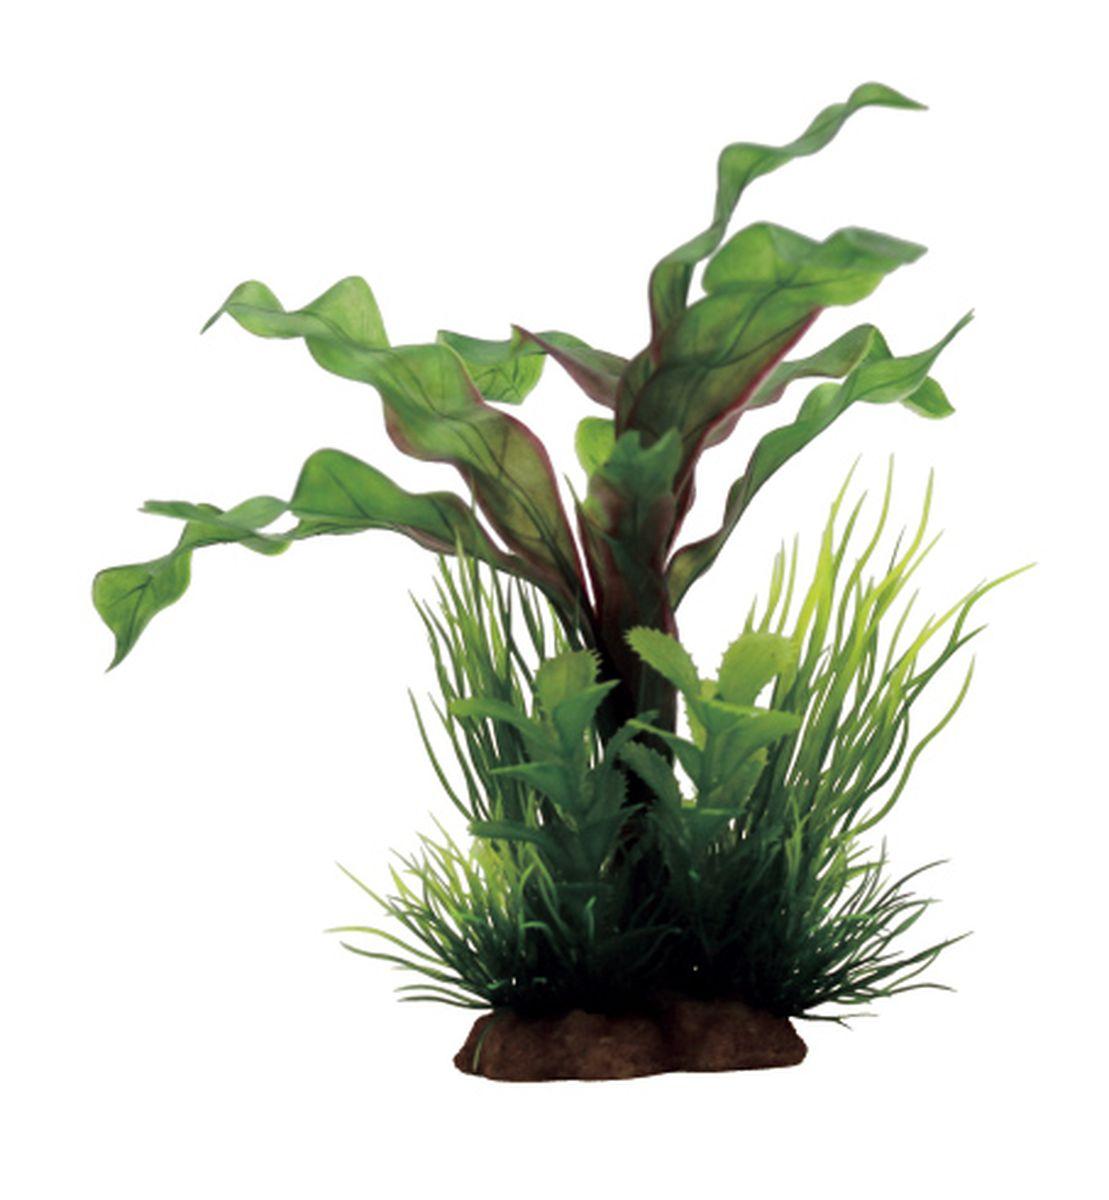 Композиция из растений для аквариума ArtUniq Апоногетон, 12 x 10 x 20 смART-1130814Композиция из растений для аквариума ArtUniq Апоногетон, 12 x 10 x 20 см